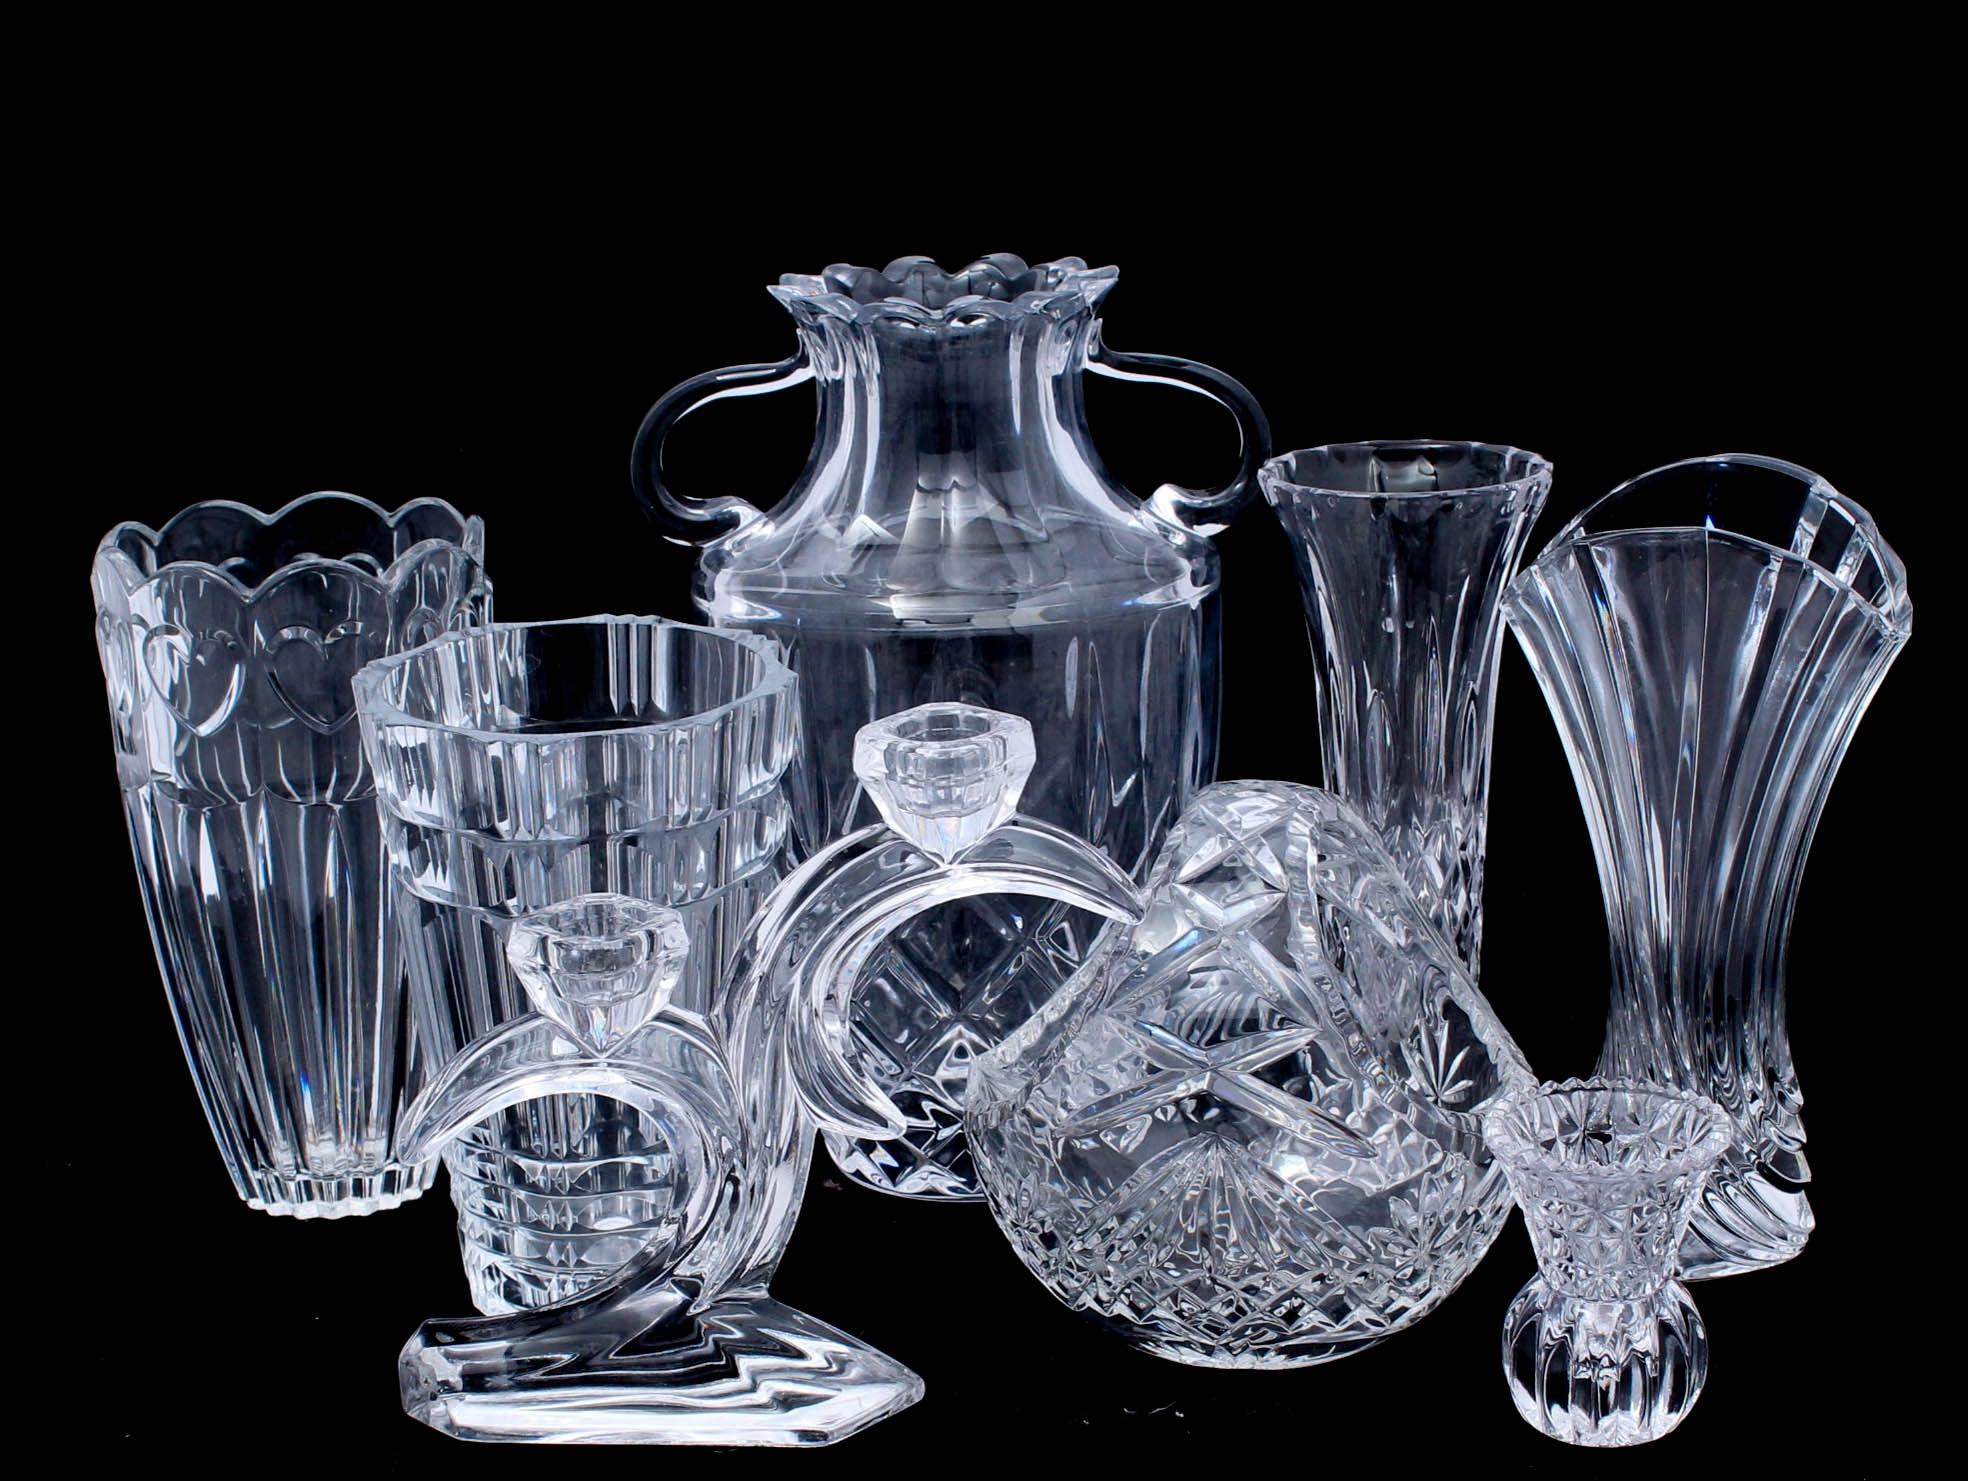 Crystal and Glass Decor Featuring Mikasa and Macryl Crystal